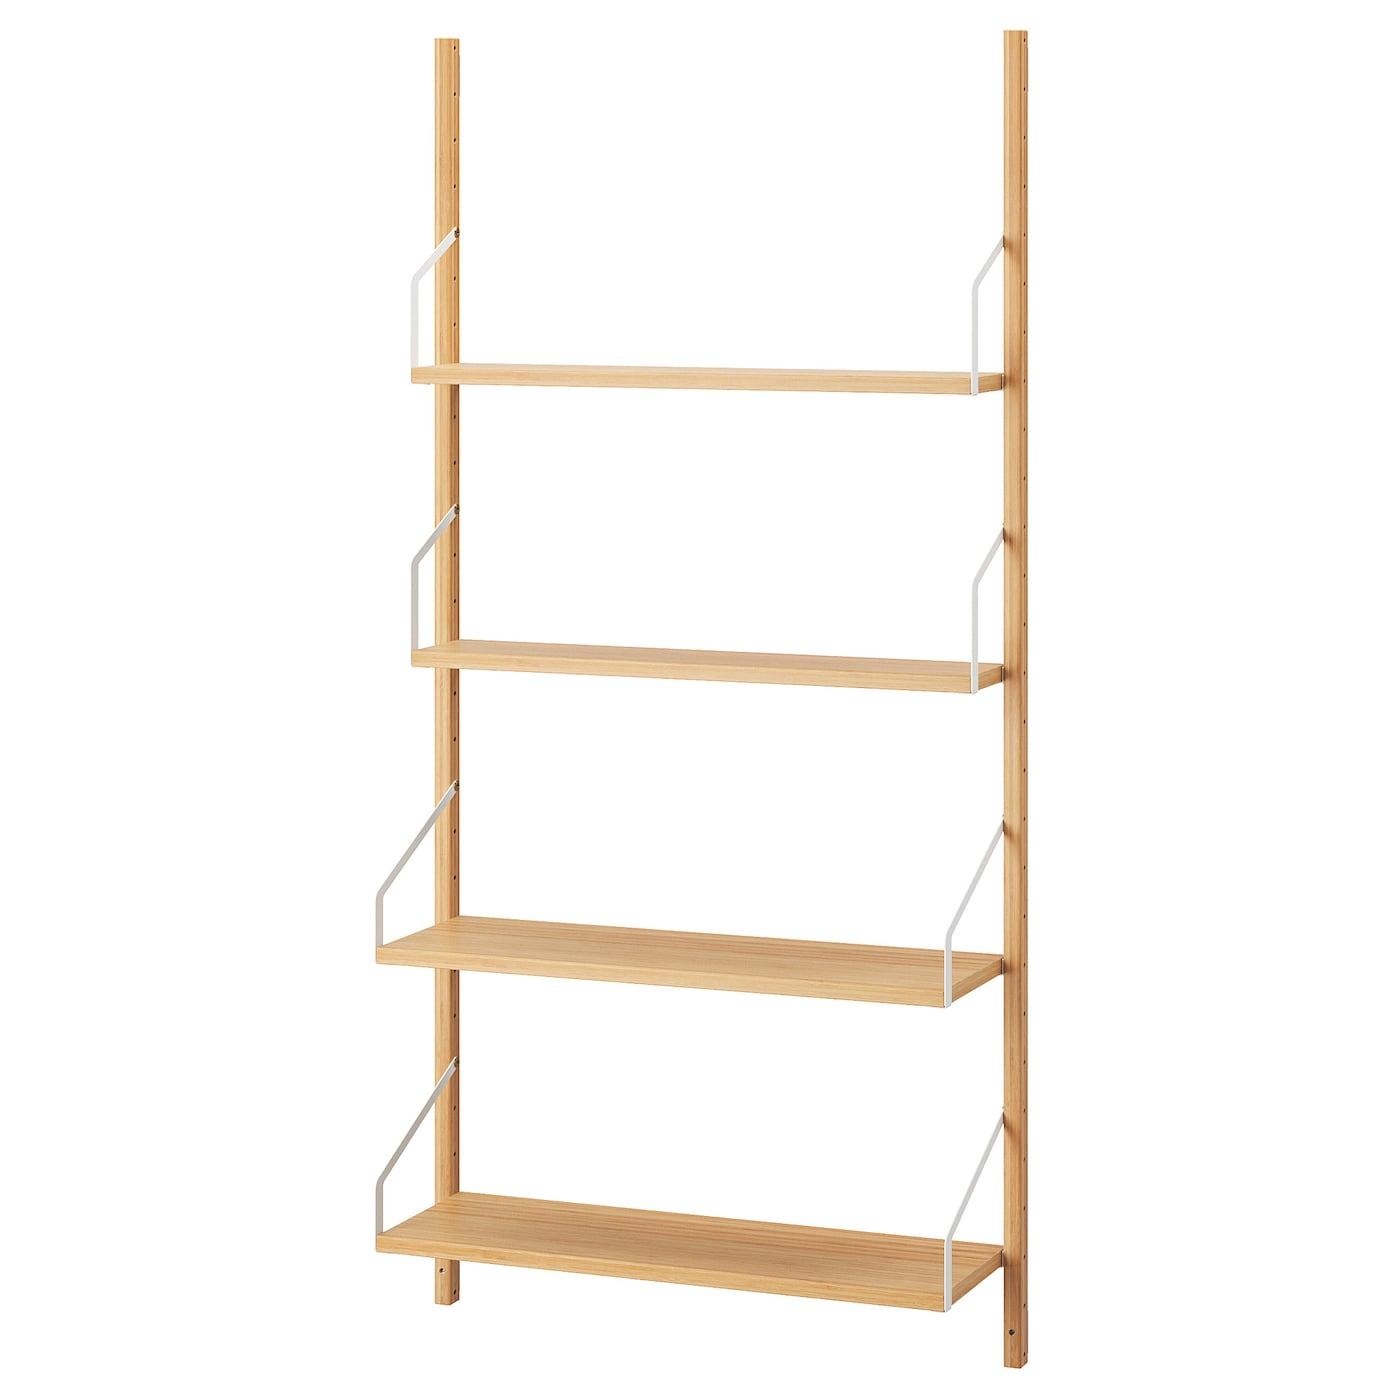 Ikea SvalnÄs Wall Mounted Shelf Combination